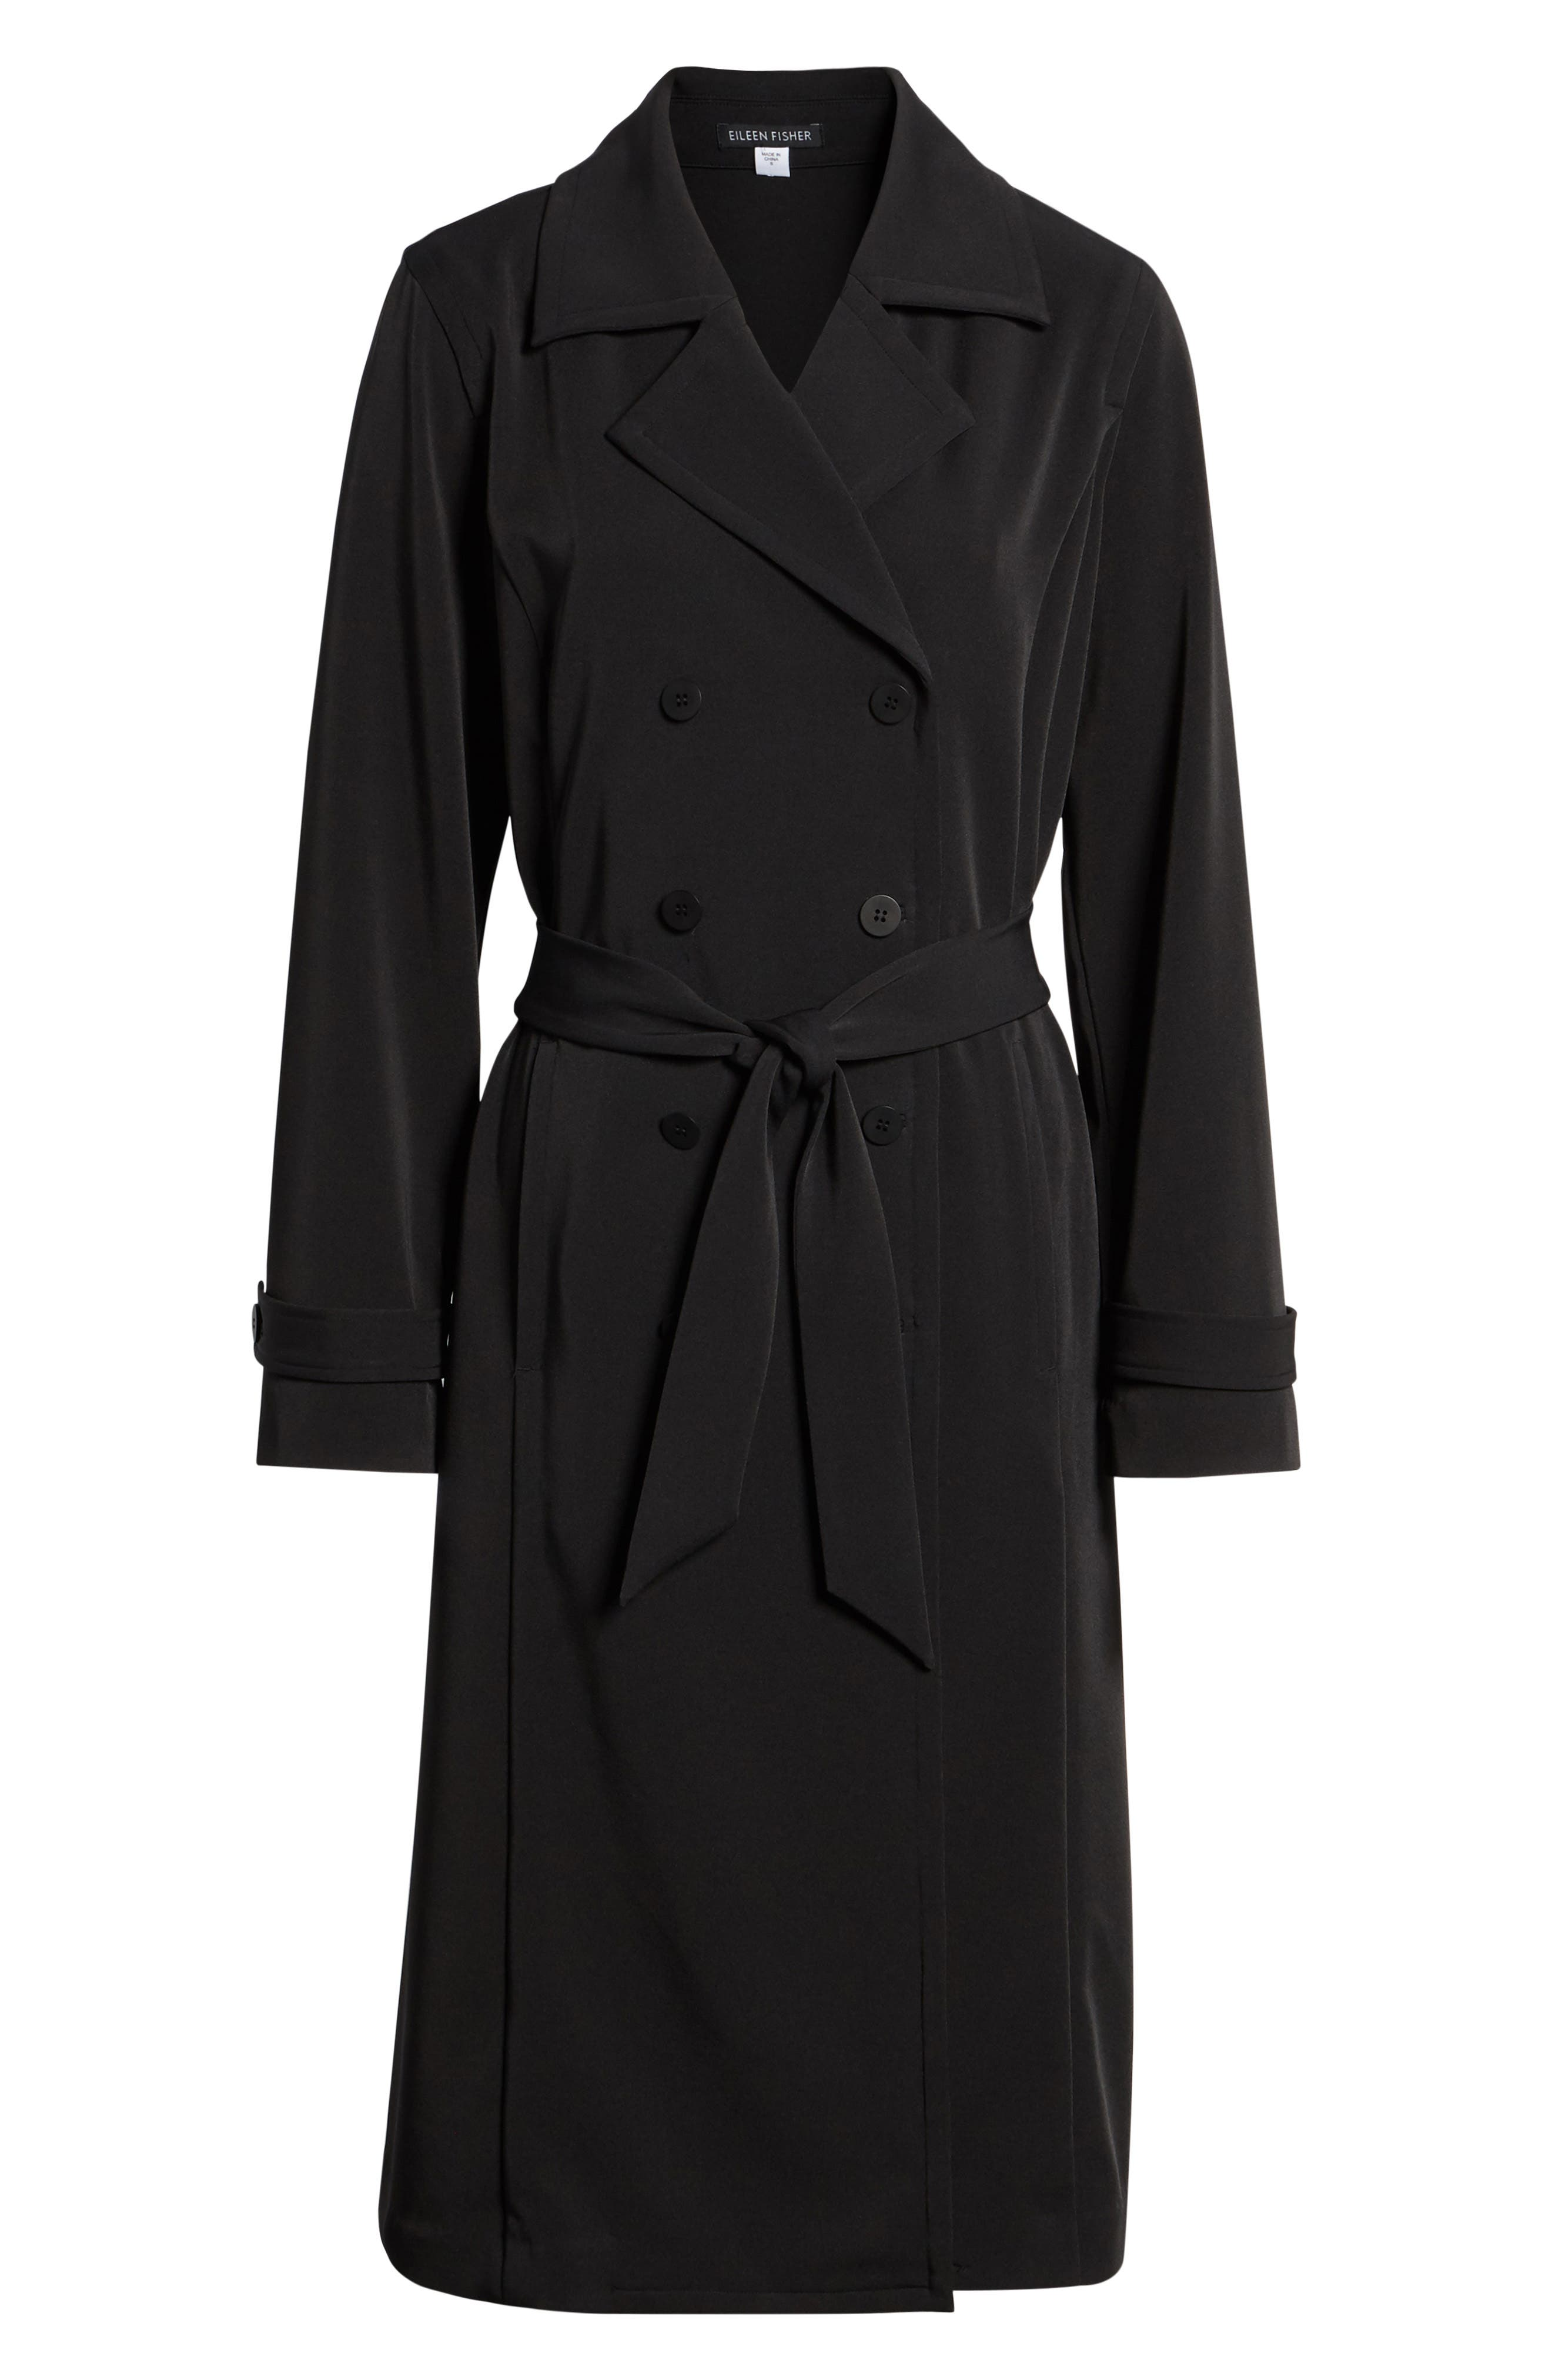 Trench Coat,                             Alternate thumbnail 7, color,                             Black